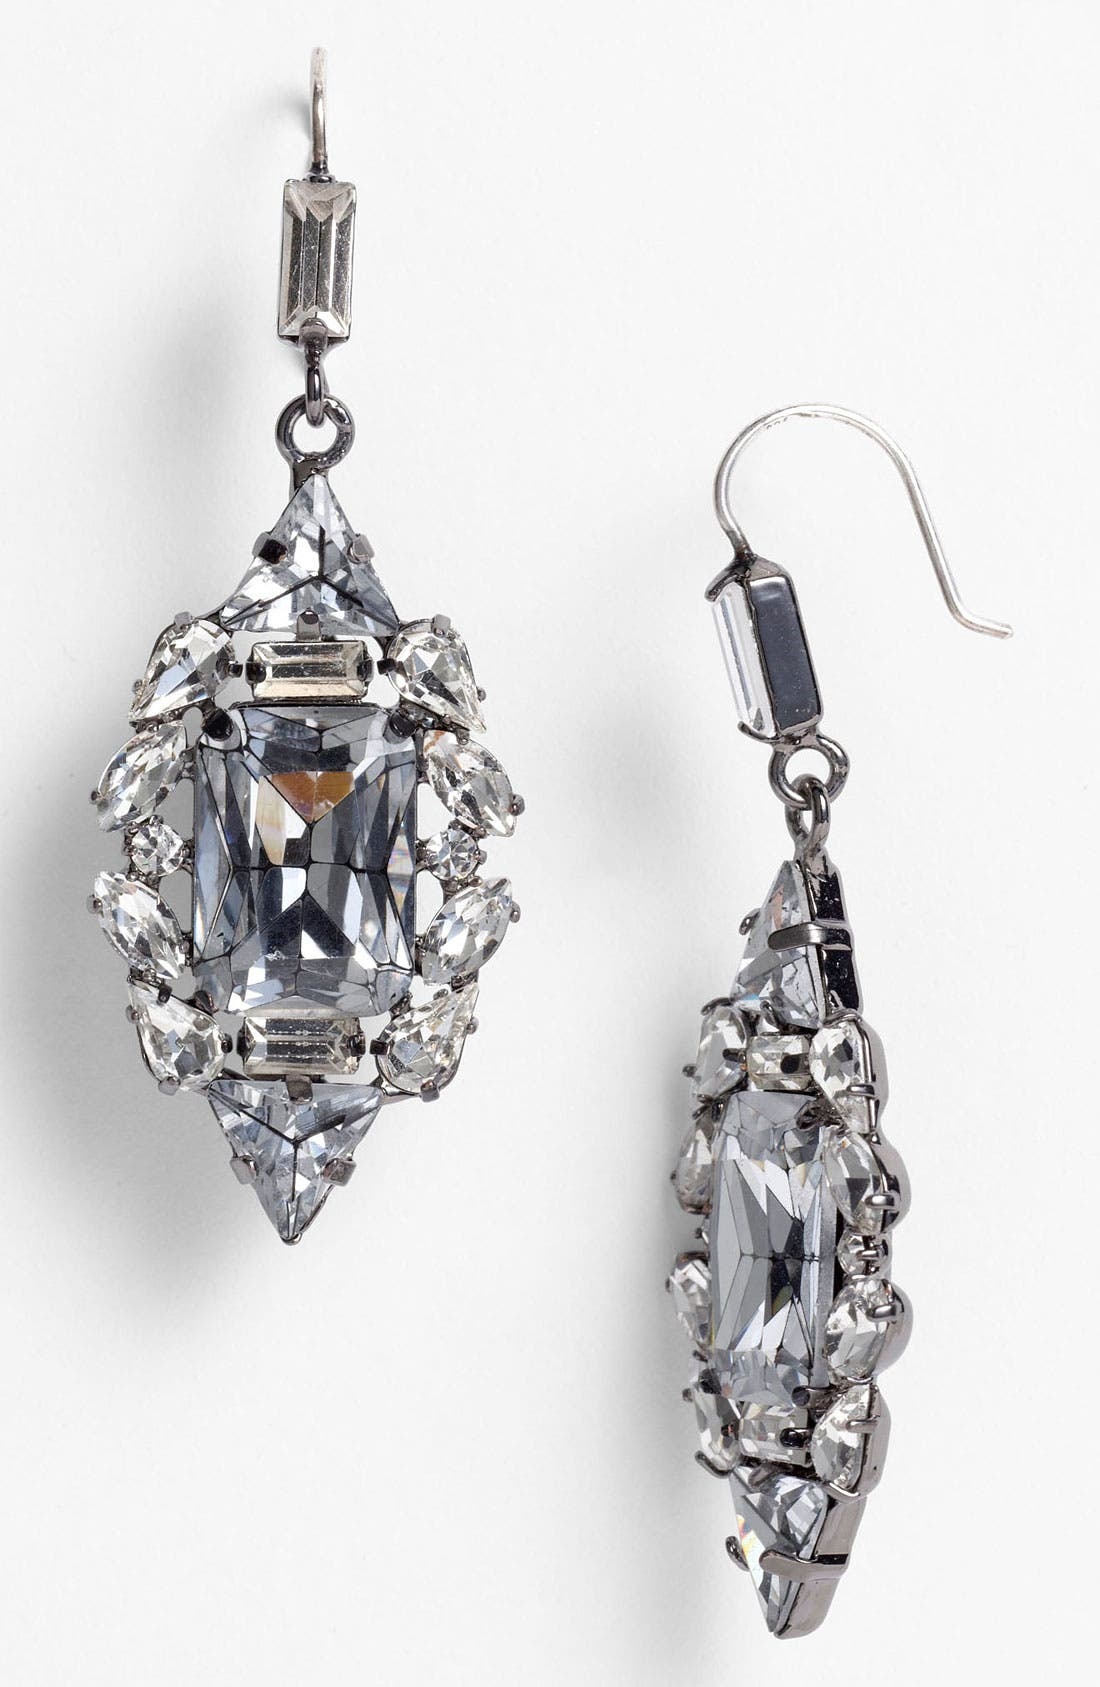 Alternate Image 1 Selected - Juicy Couture 'Punk Rocks' Cluster Drop Earrings